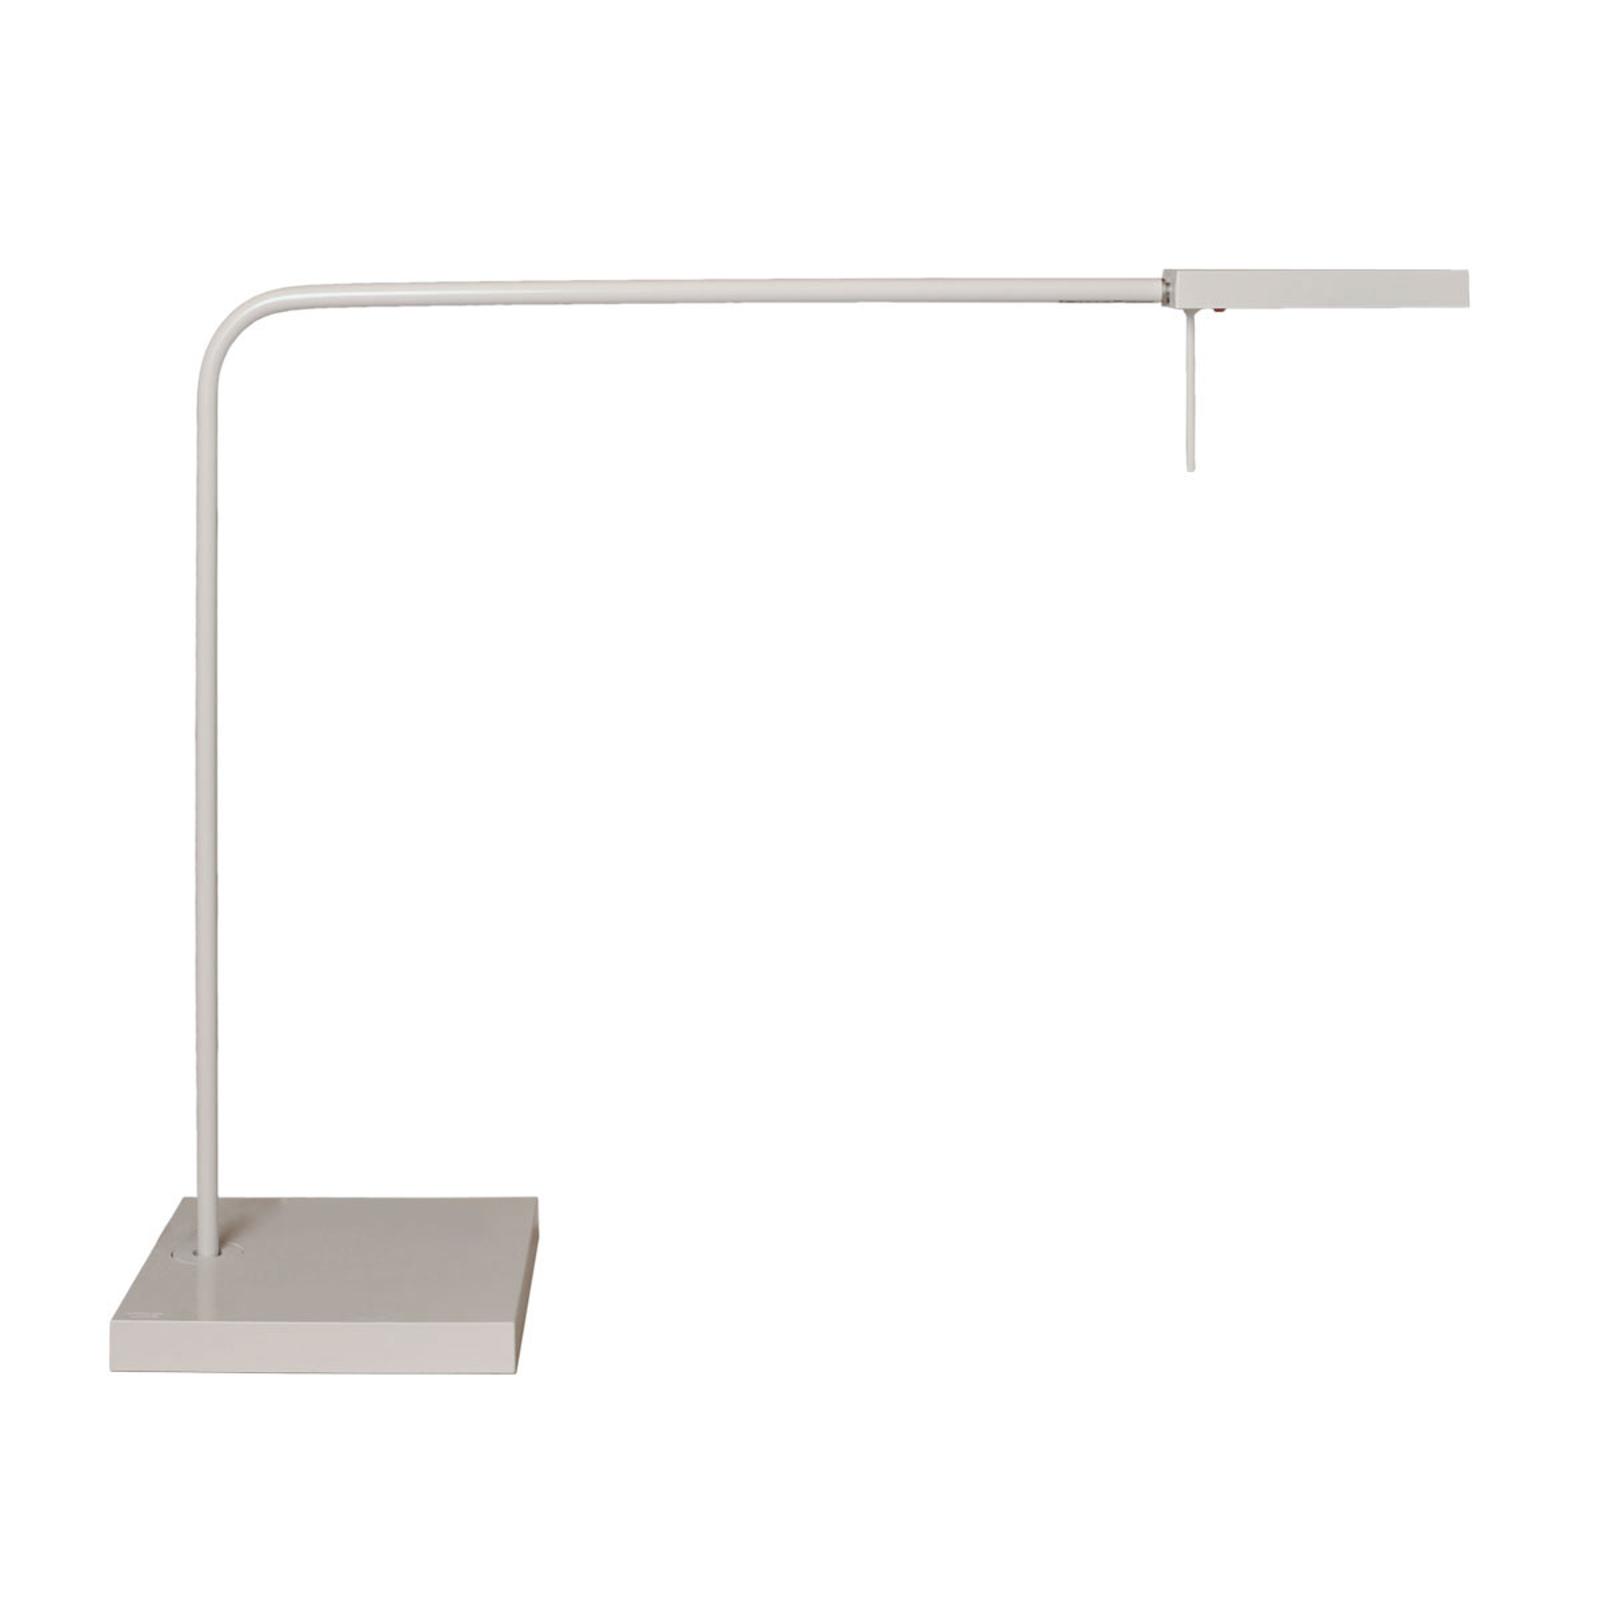 LED bureaulamp Ninety met voet in wit